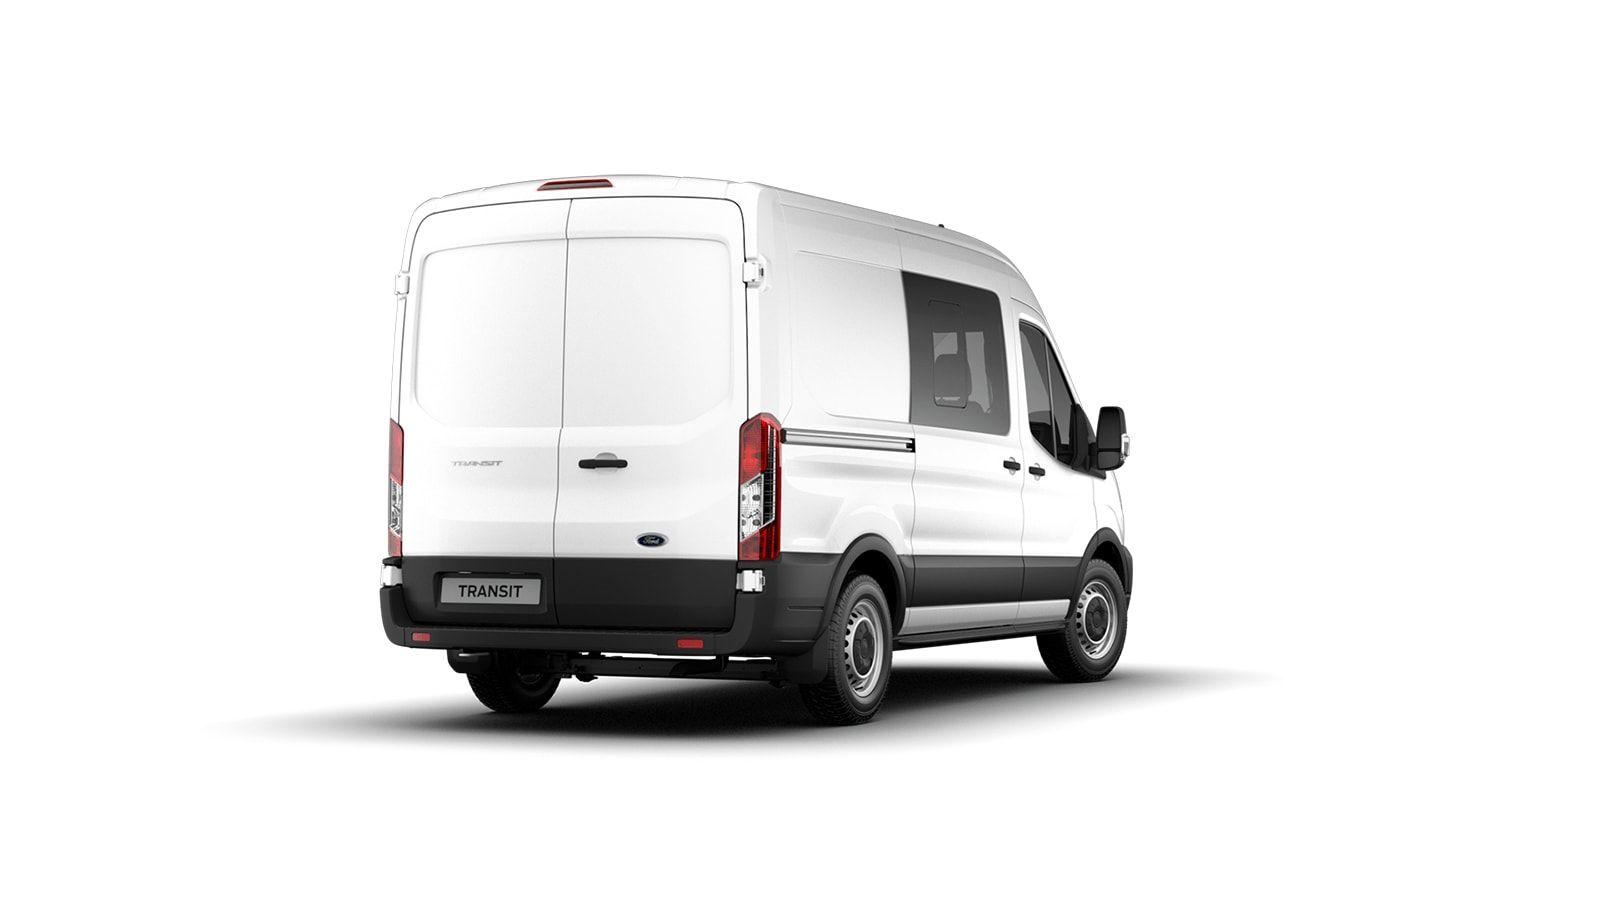 Nieuw Ford Transit 2t mca 350L Minibus L3 Trend mHEVM6 2.0 TD 130 pk M1 Euro 6.2 AXW - niet-metaalkleur: Frozen White 4